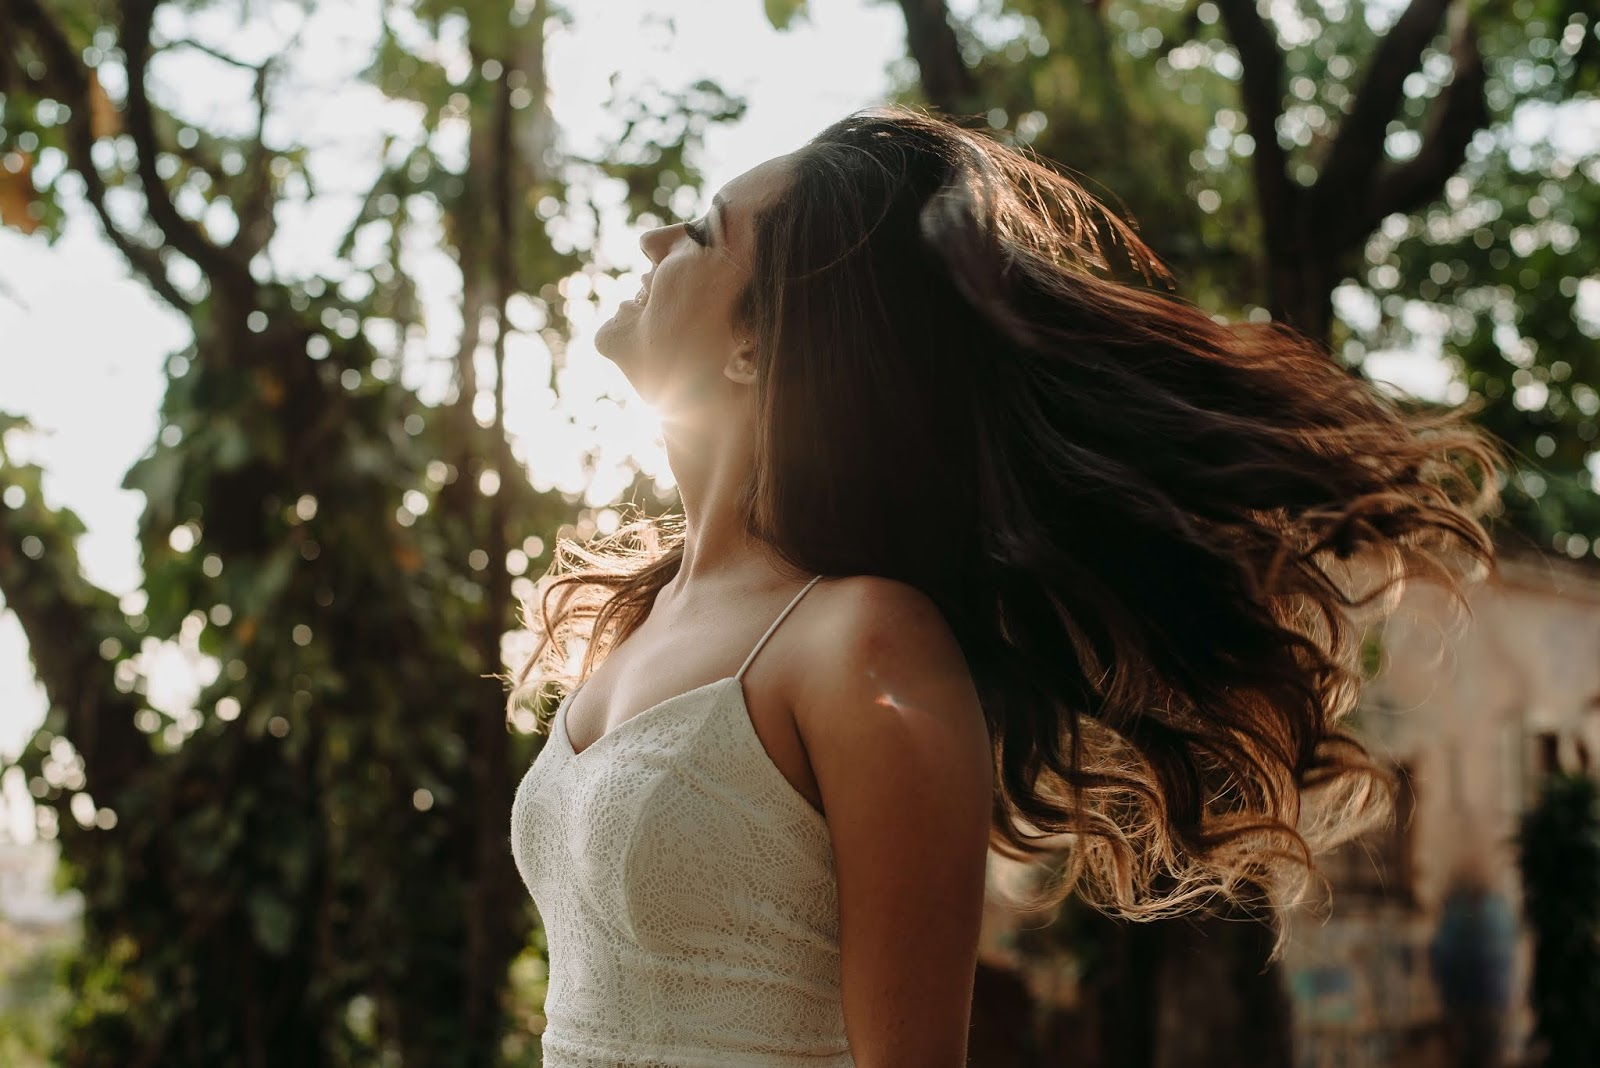 hair growth secret of yao women